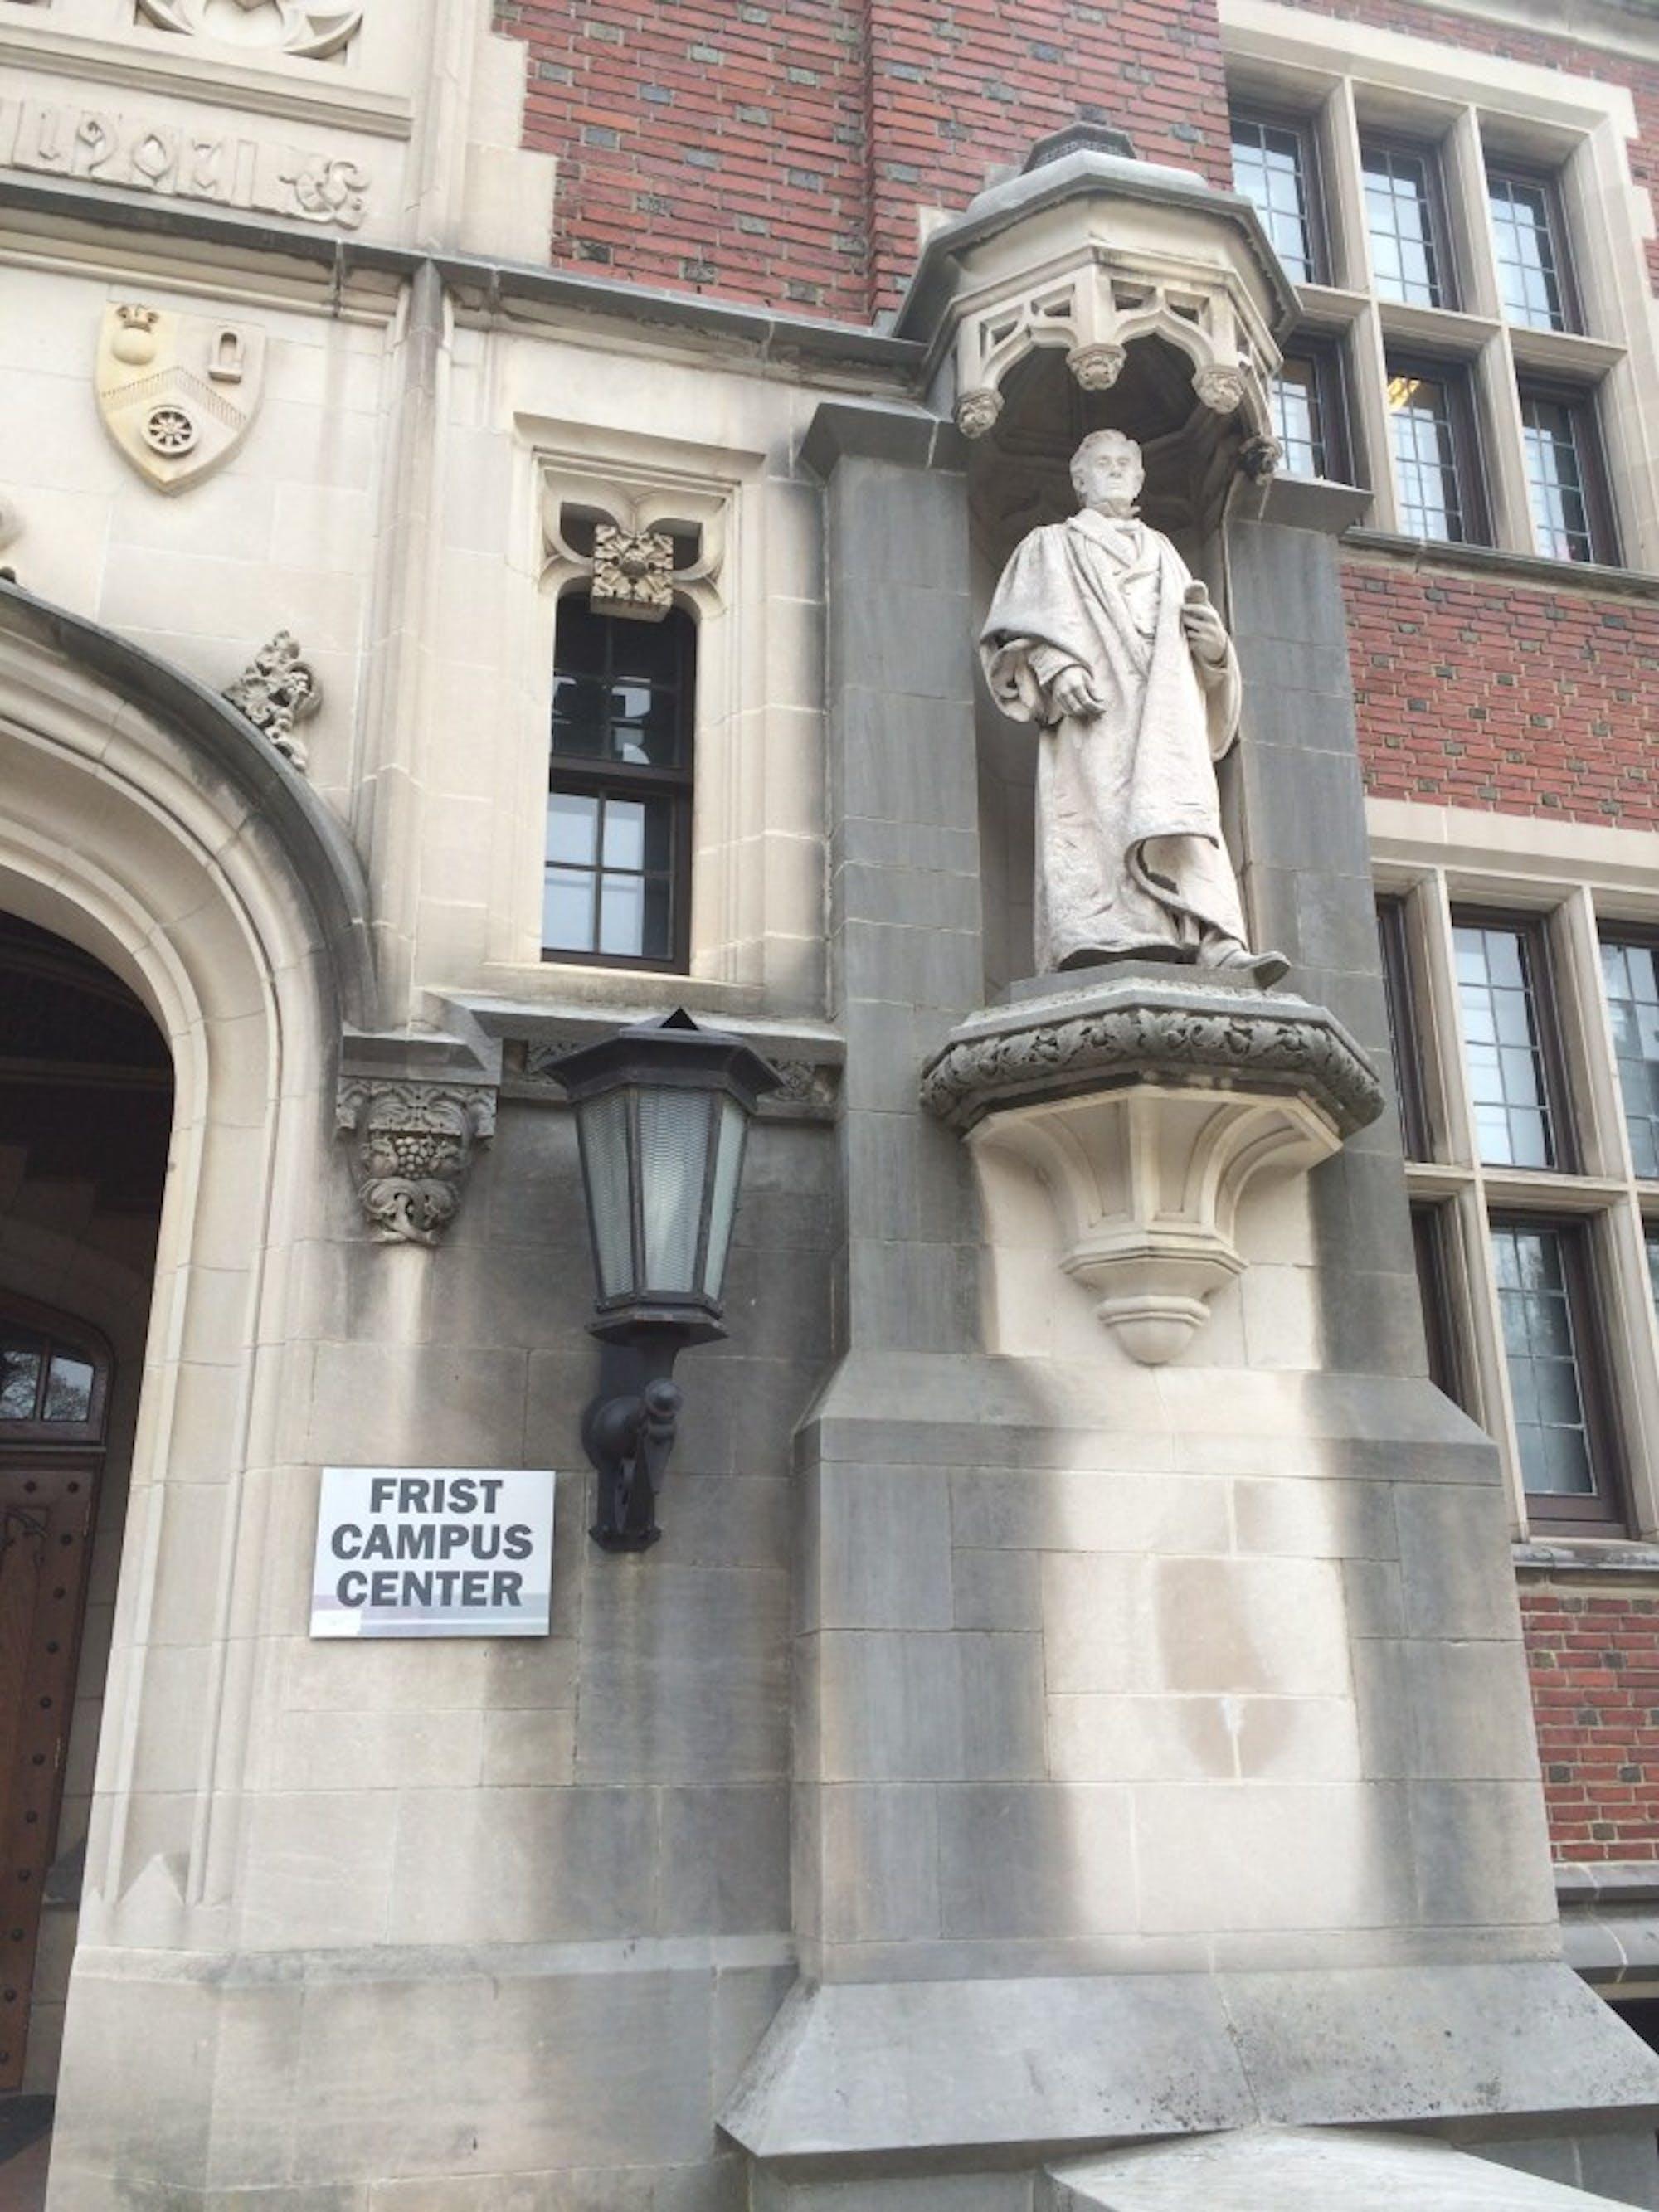 joesph-henry-statue-outside-of-frist-campus-center-princeton-university